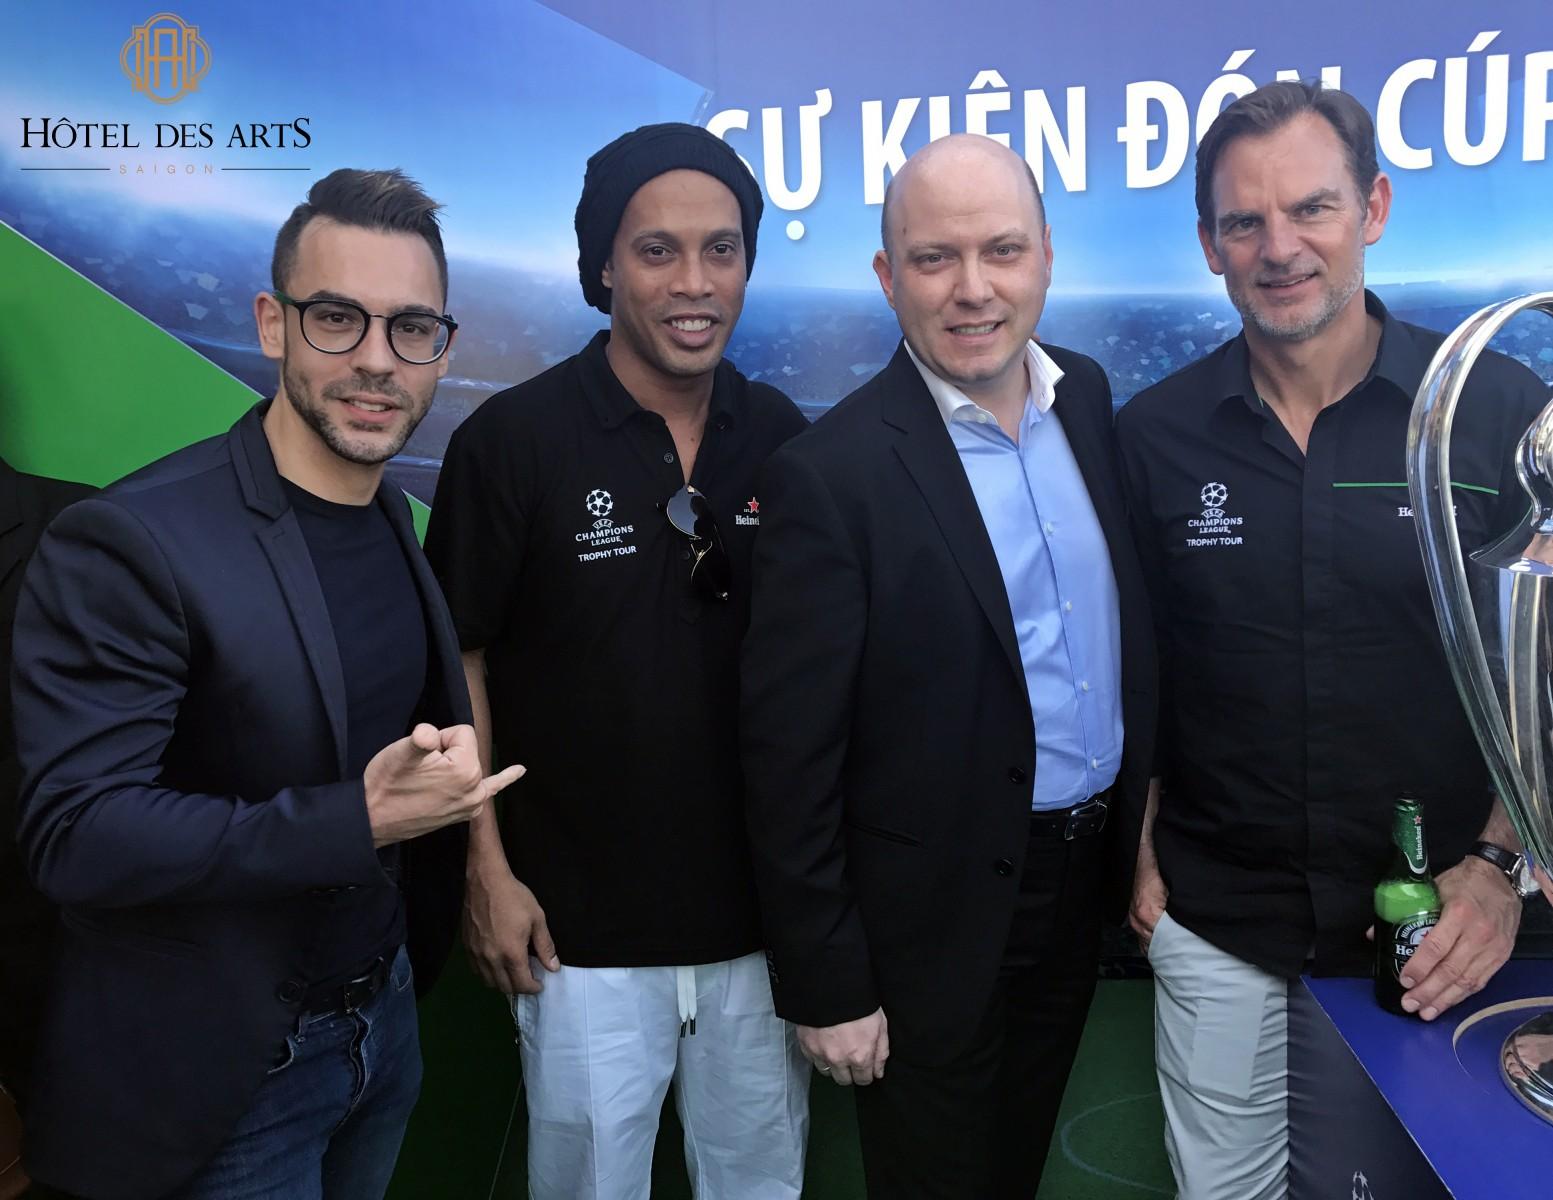 ronaldinho-brought-uefa-champions-league-trophy-to-social-club-saigon